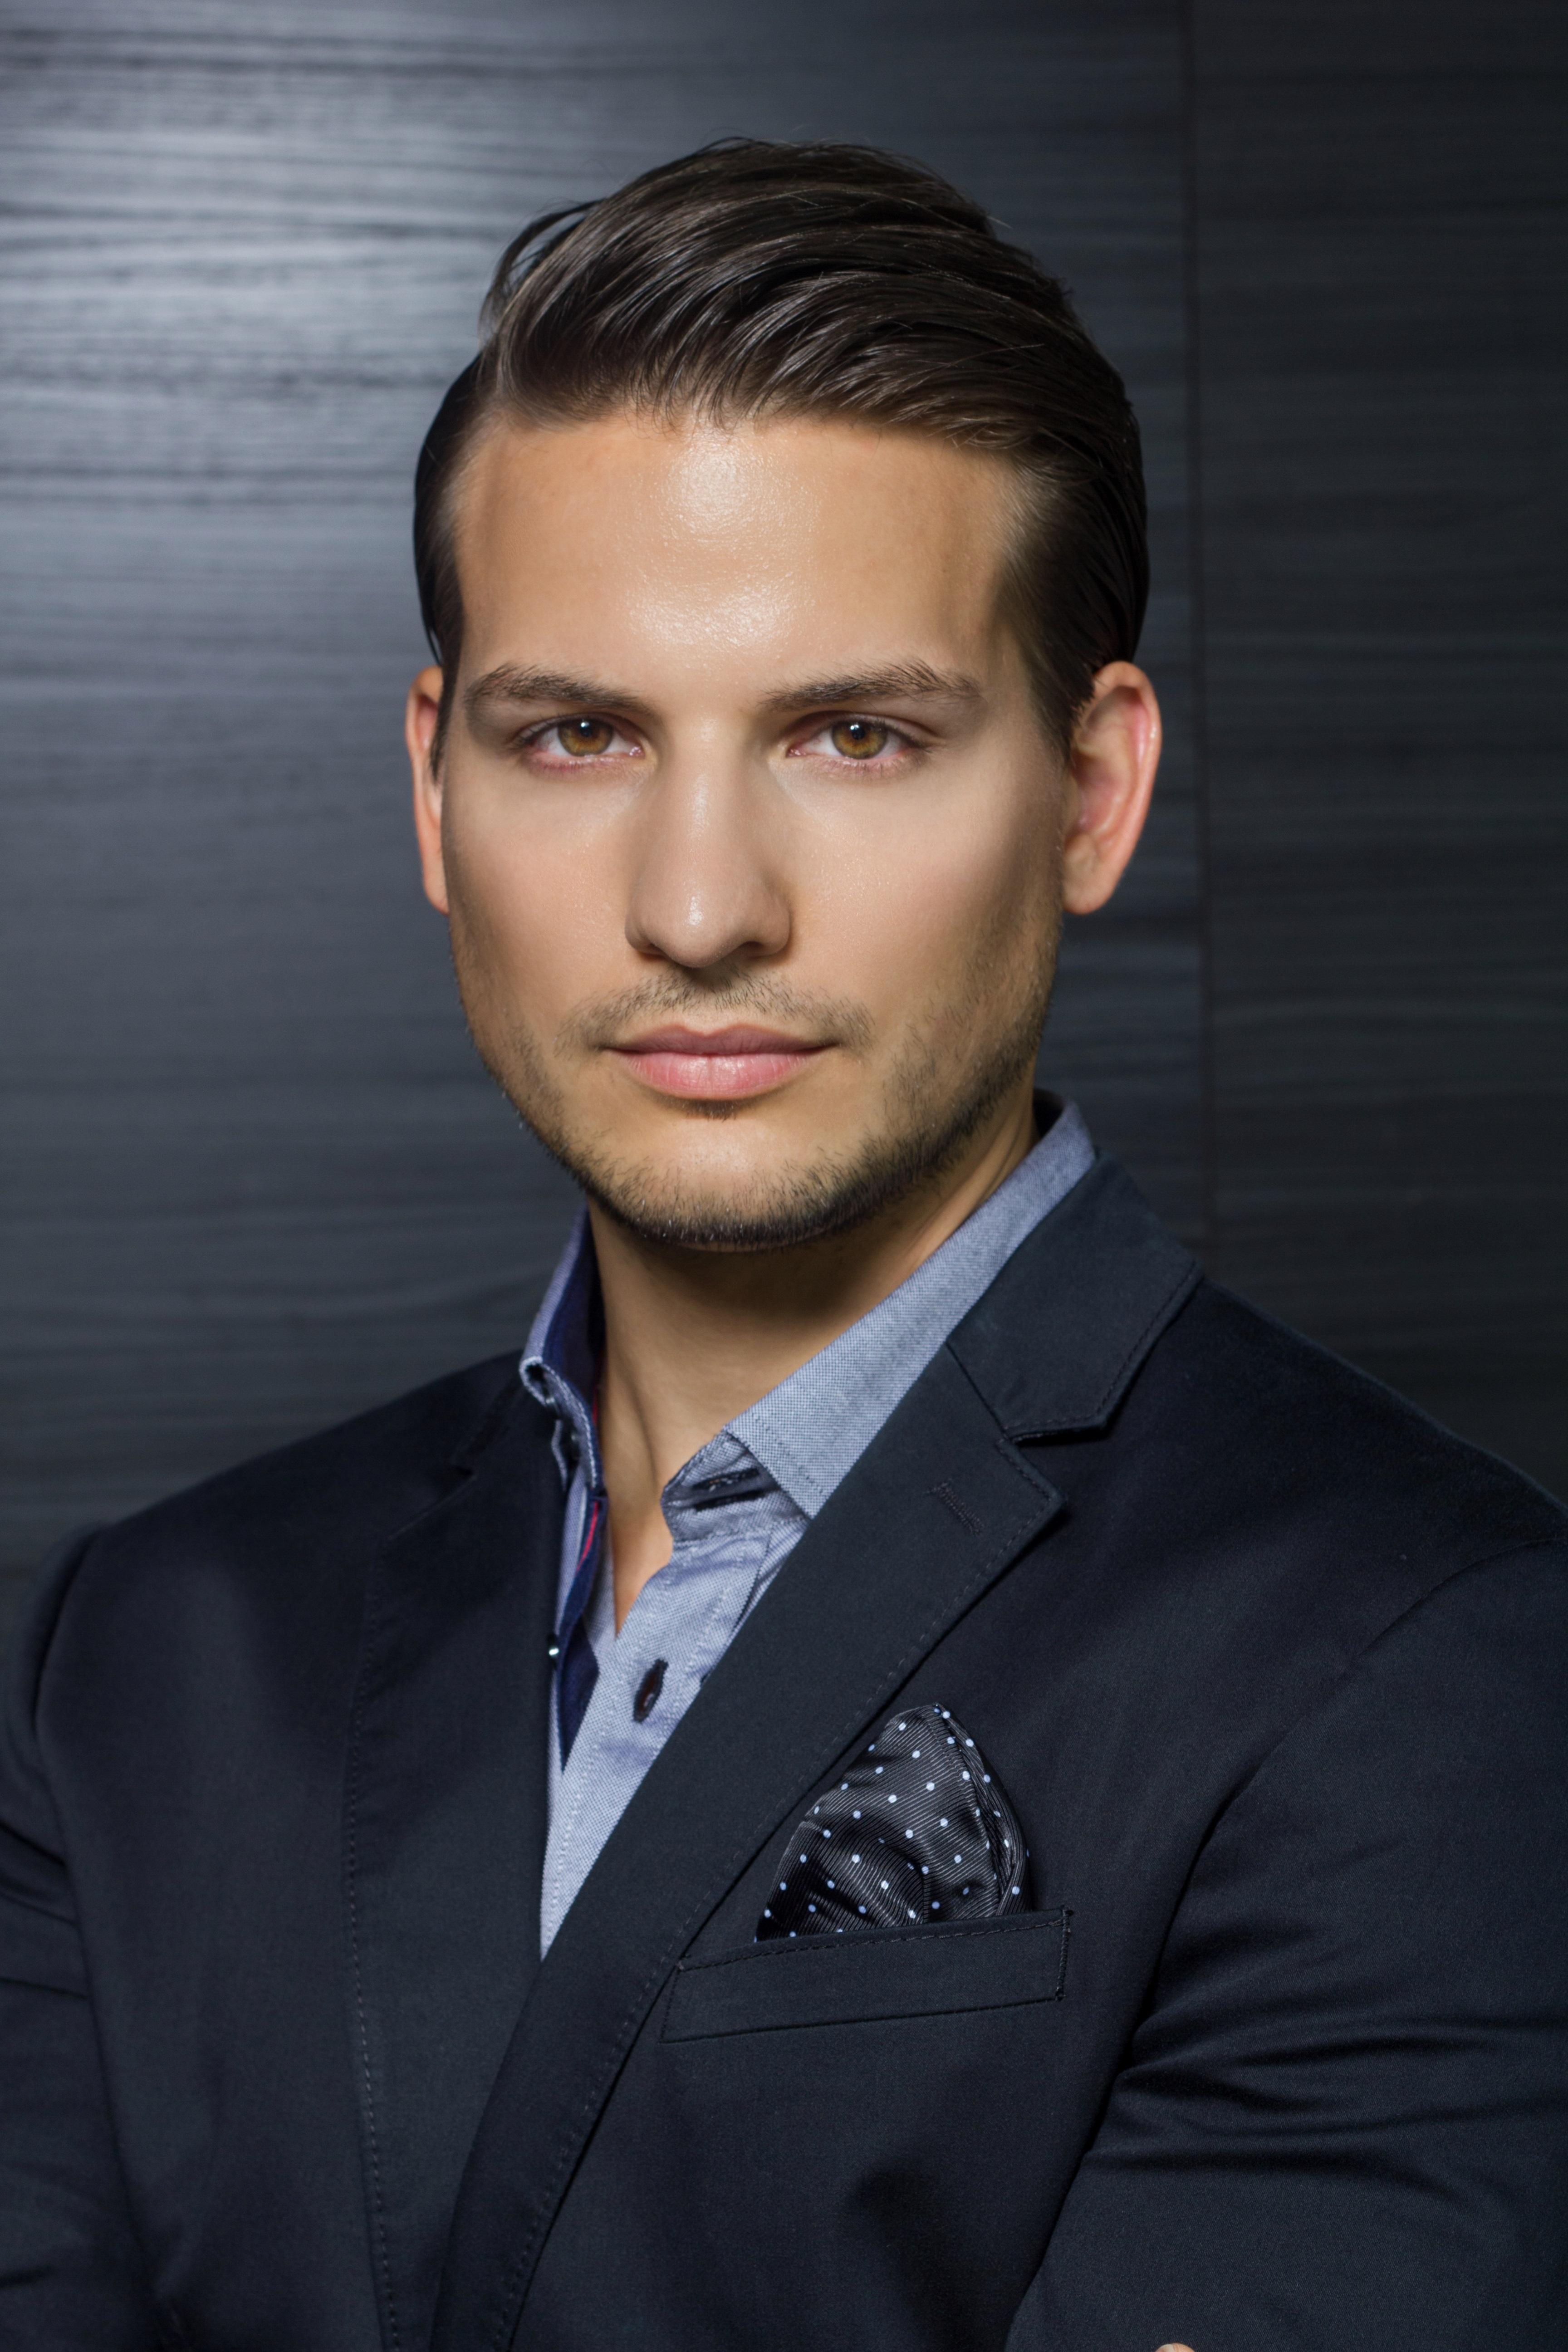 daniel Zoltan nyiri fashion model personal trainer entrepreneur owner of 4u fitness